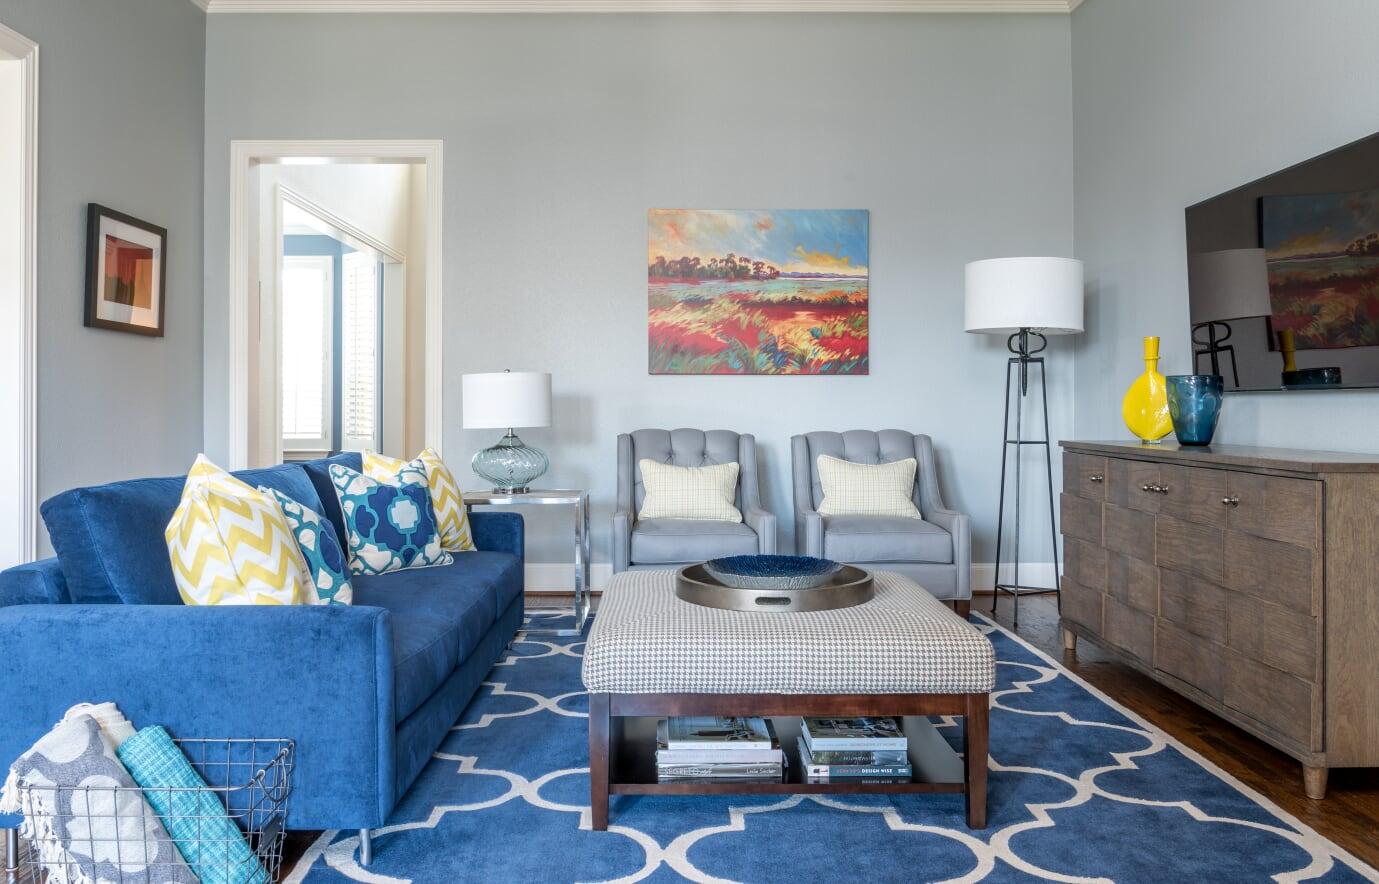 Sanders - Living Room 8 - Dallas Interior Designer serving Plano, Frisco, Dallas, Allen for Decorating Den Interiors D'KOR HOME by Dee Frazier Interiors